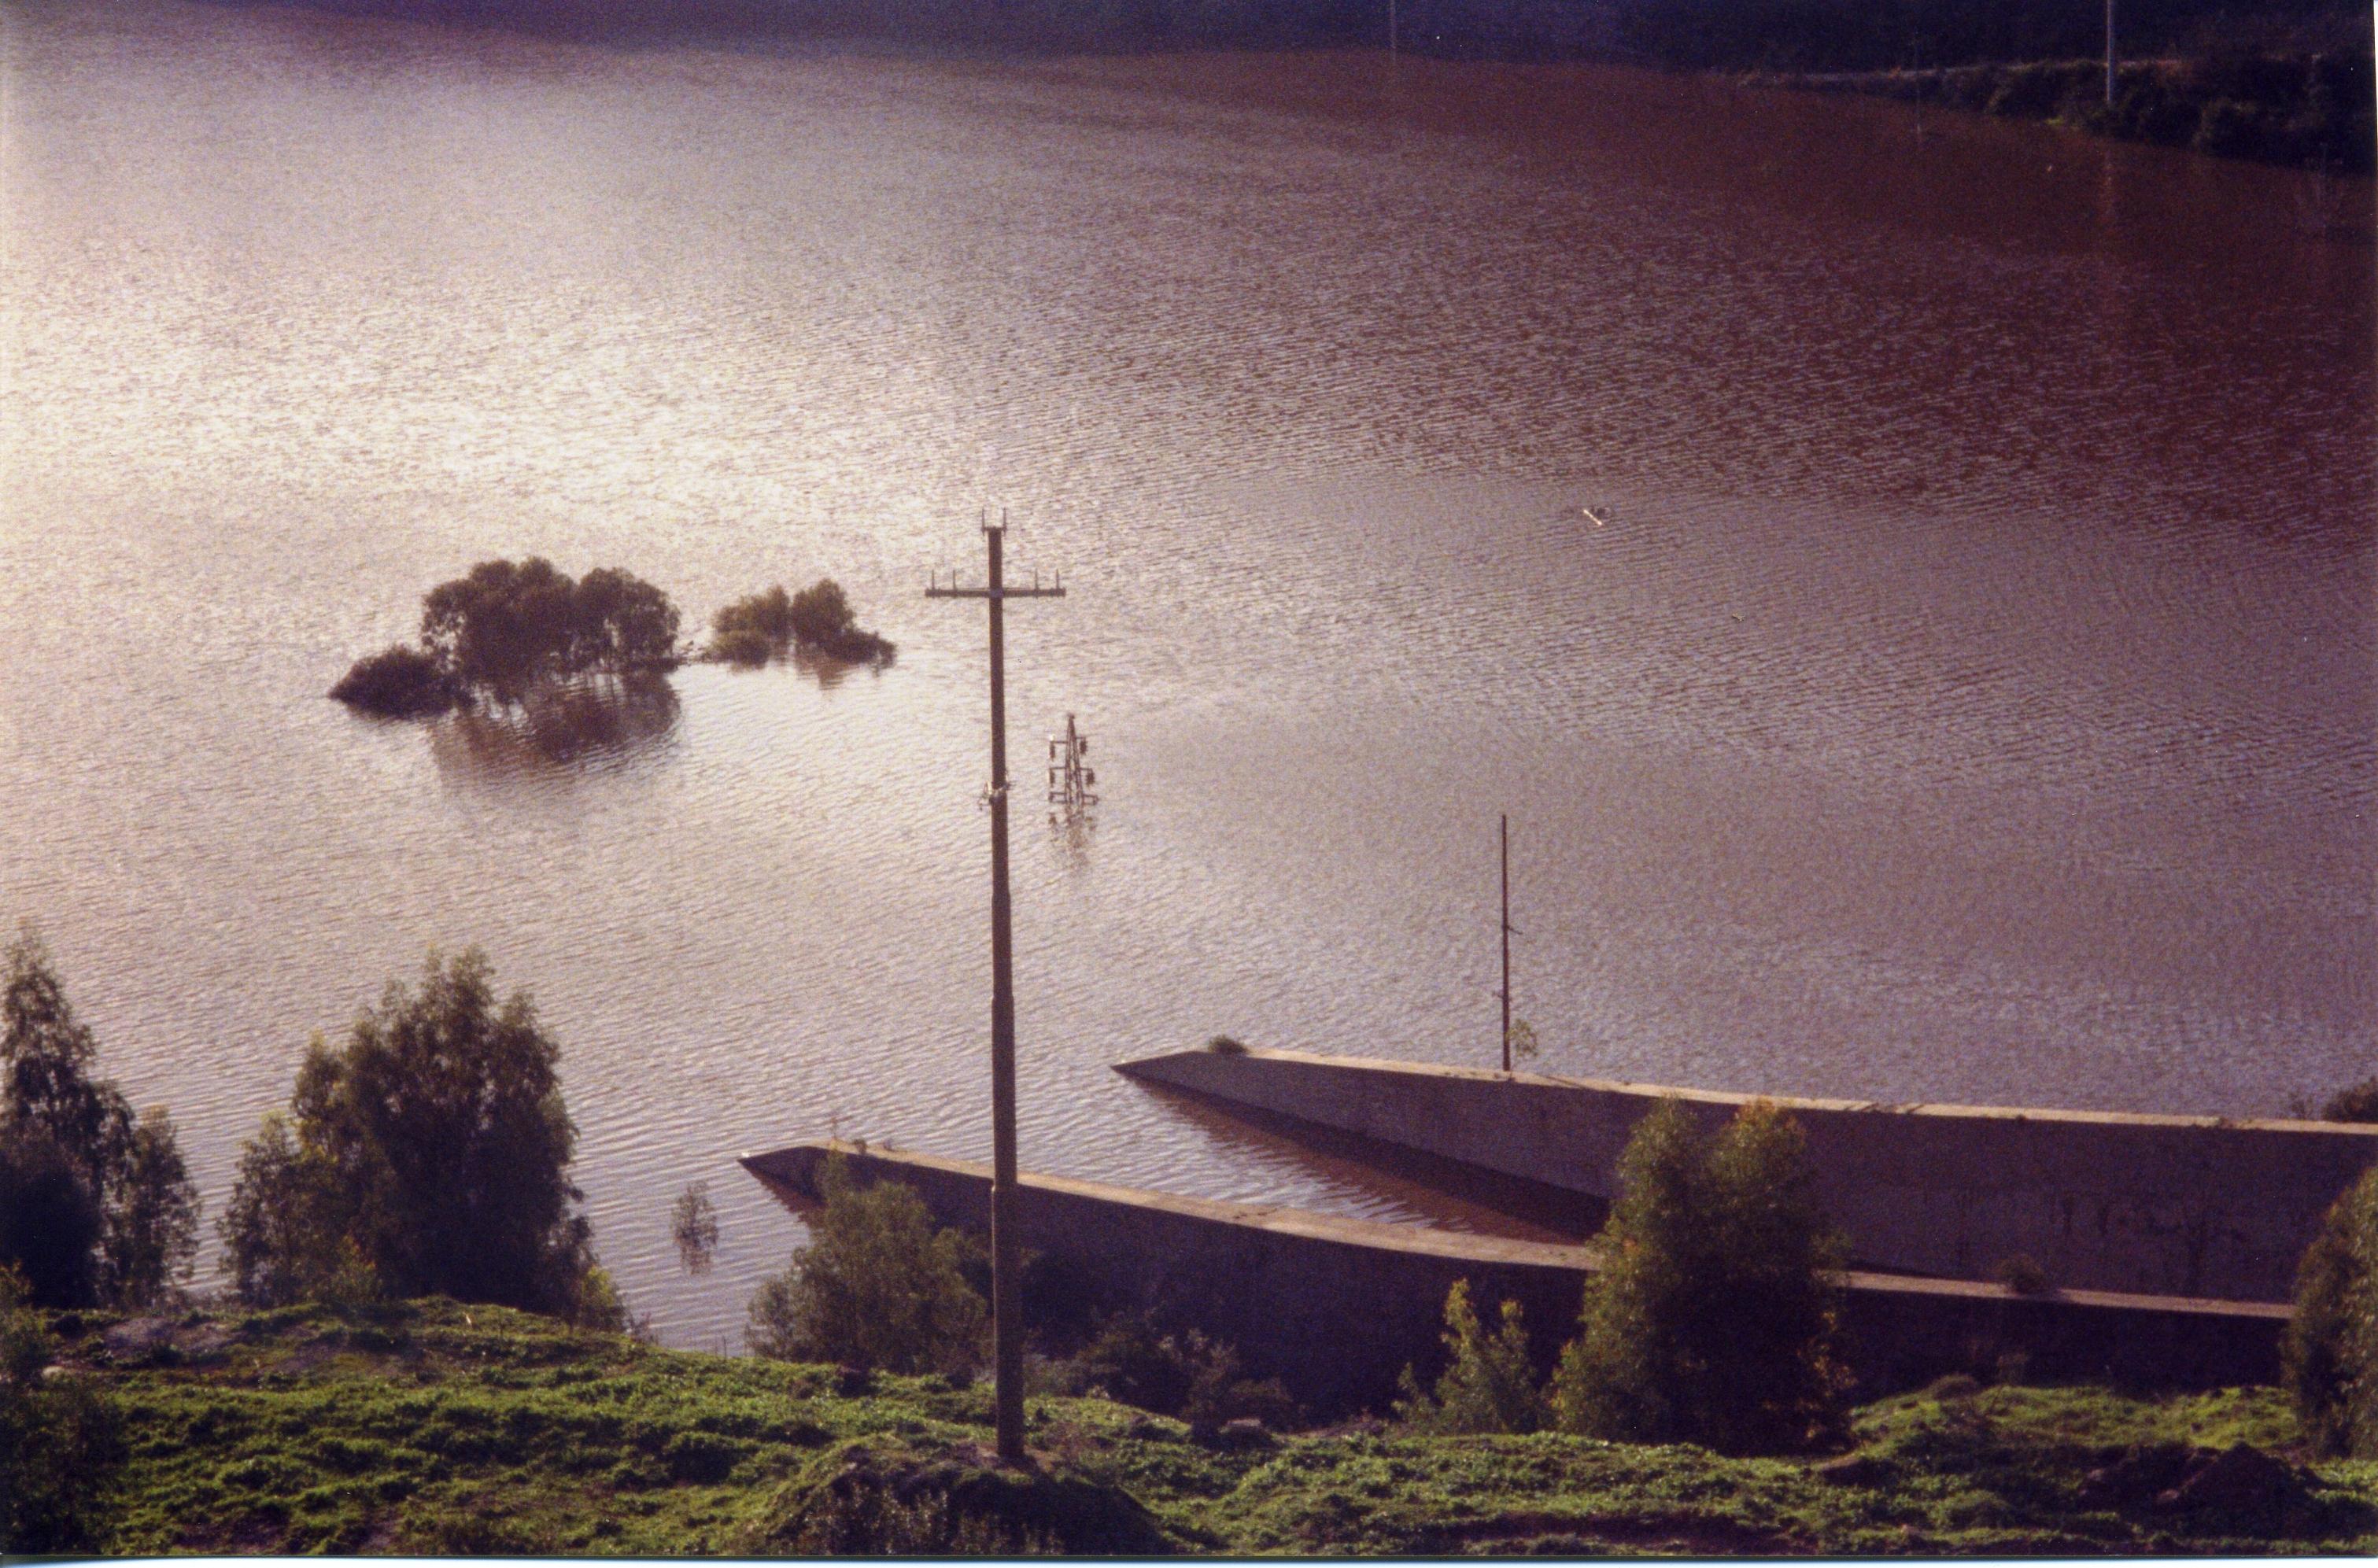 Gennaio 2001 - Oggetti sommersi